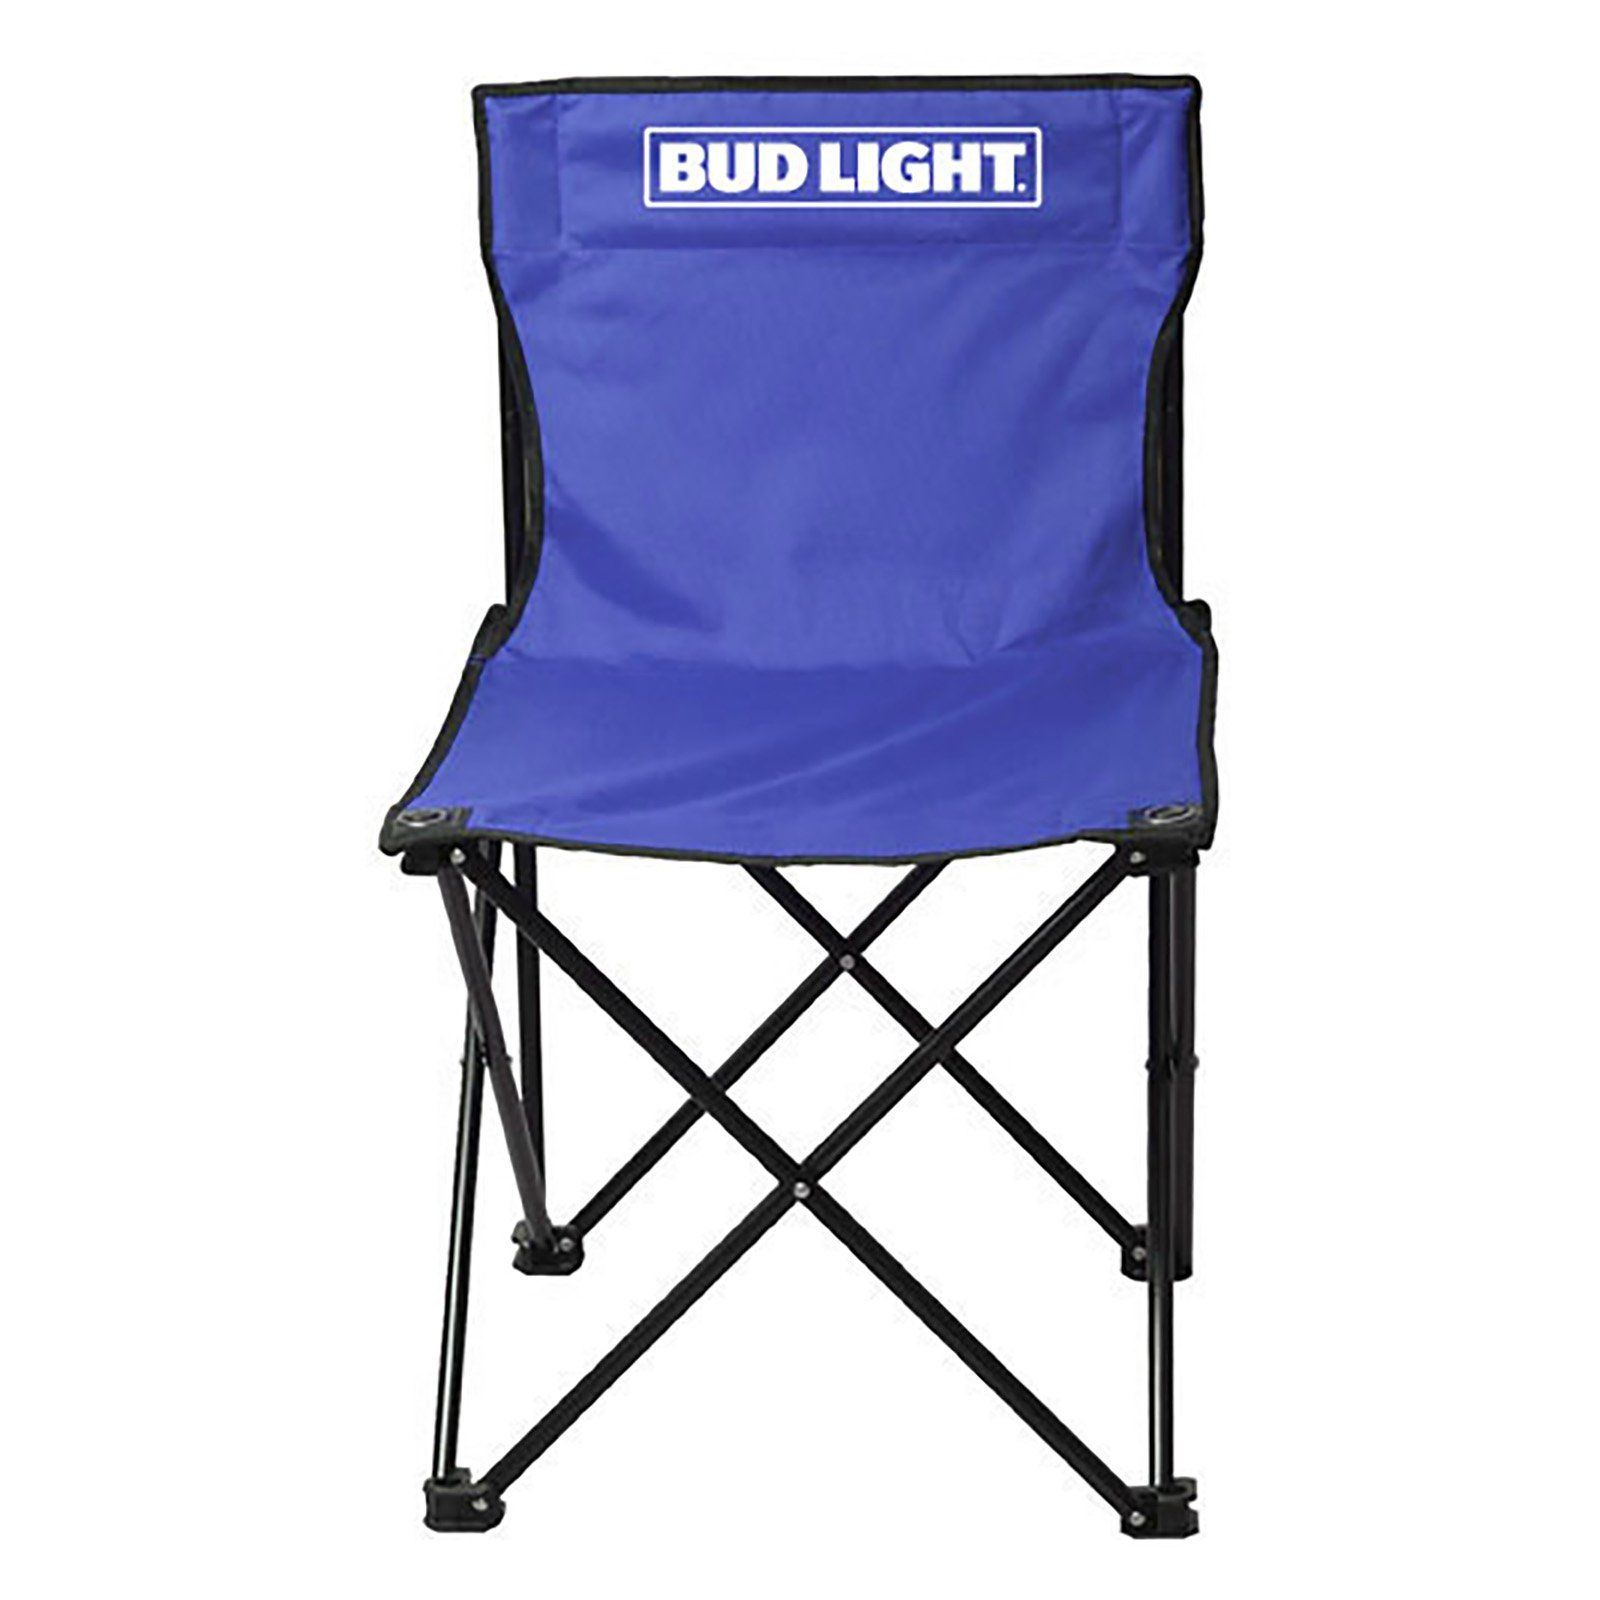 Outdoor Bud Light Armless Folding Lawn Chair   TG 7865BL